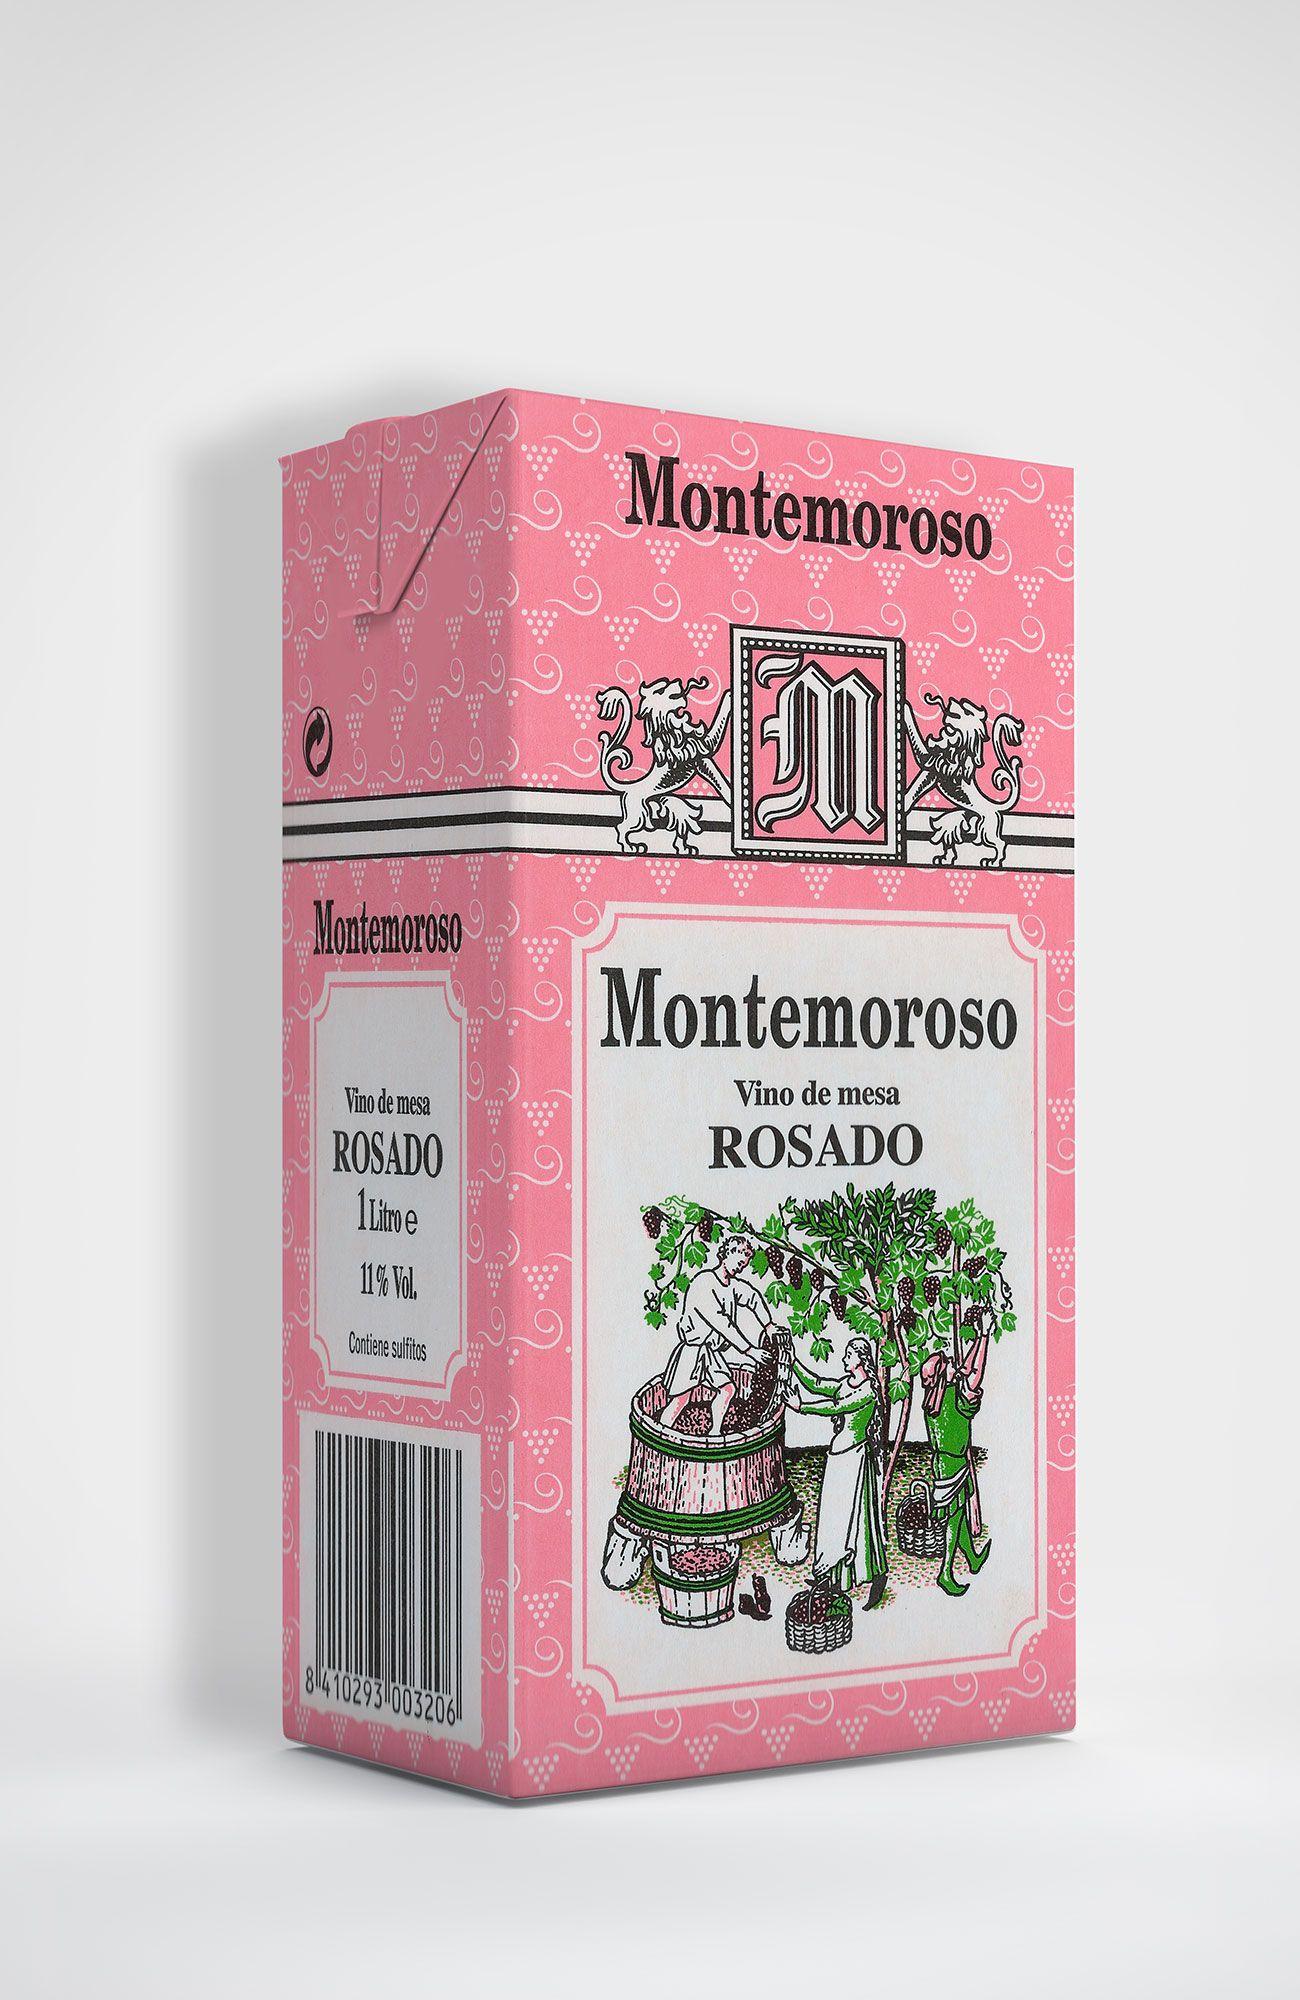 Benito Blázquez - Brik de Vino Montemoroso Rosado